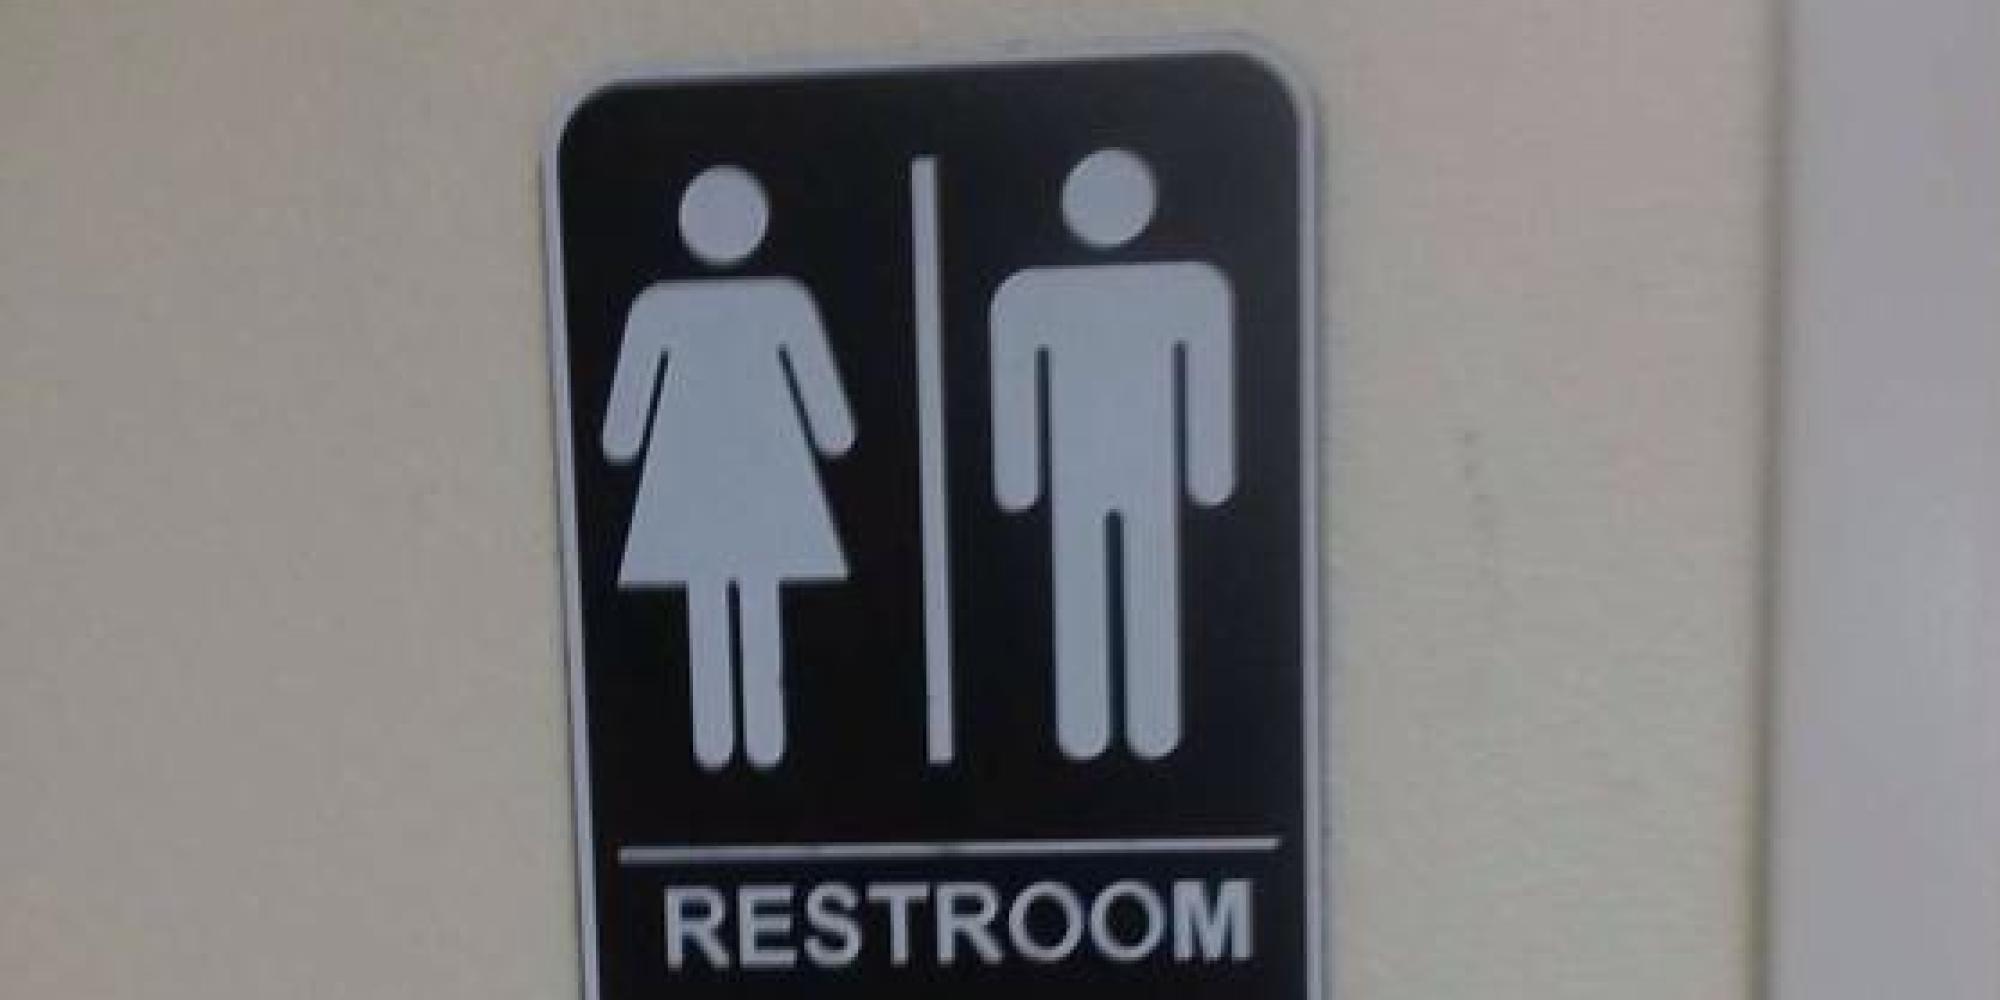 Gender Neutral Bathrooms To Be Installed In Ottawa Schools